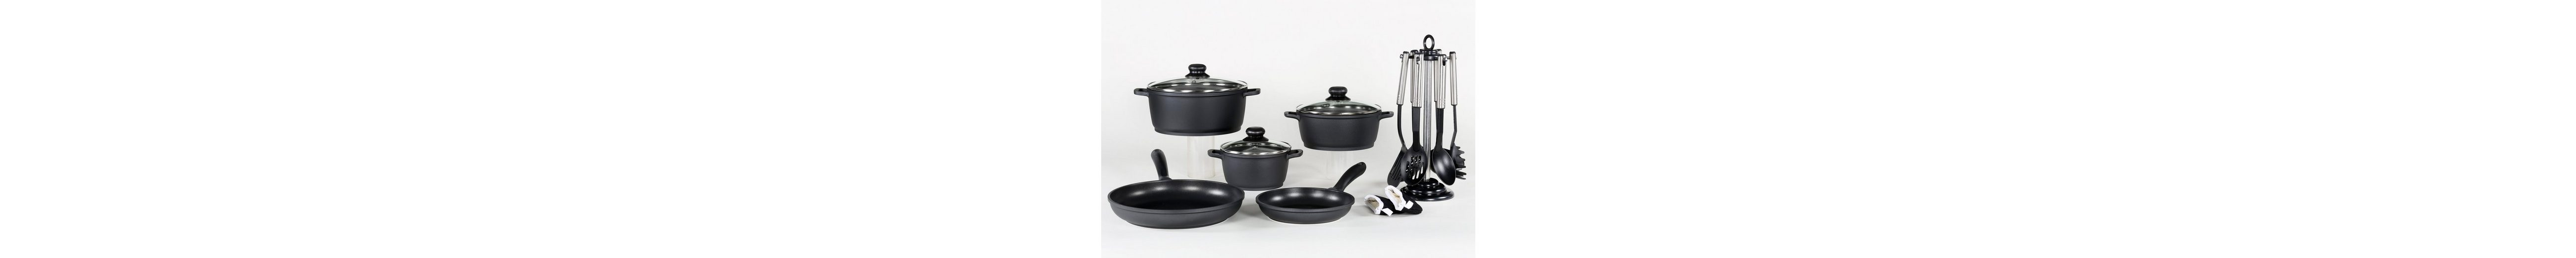 Aluguss-Kochserie 15-teilig, Krüger